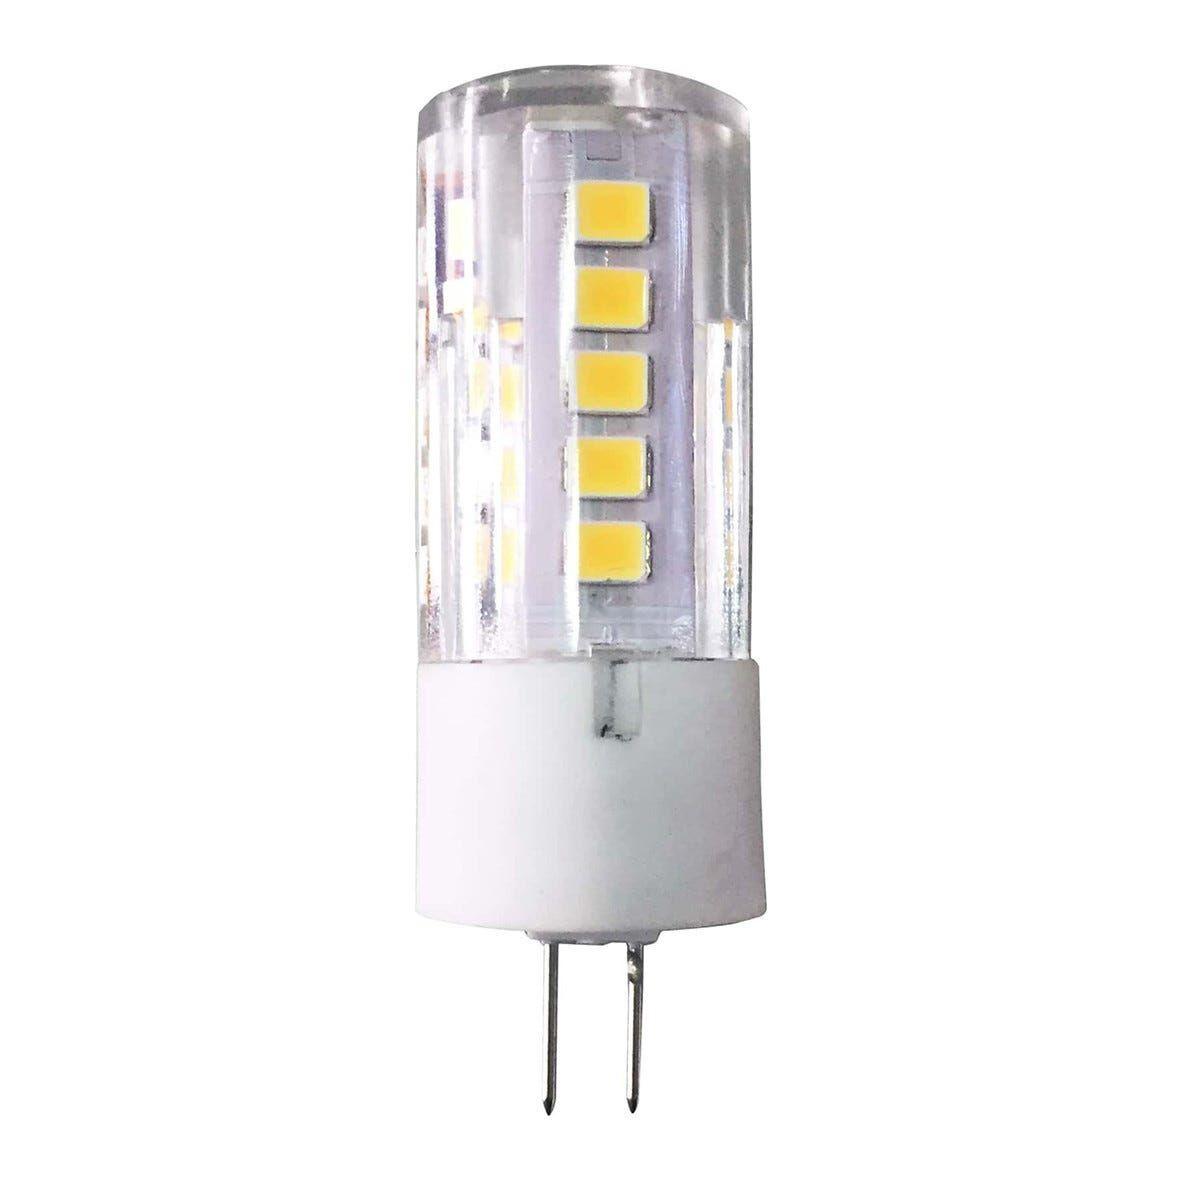 parko 2 lampadine  led mr11 g4 3w=25w 300 lumen 6500k luce fredda Ø 16x46 mm